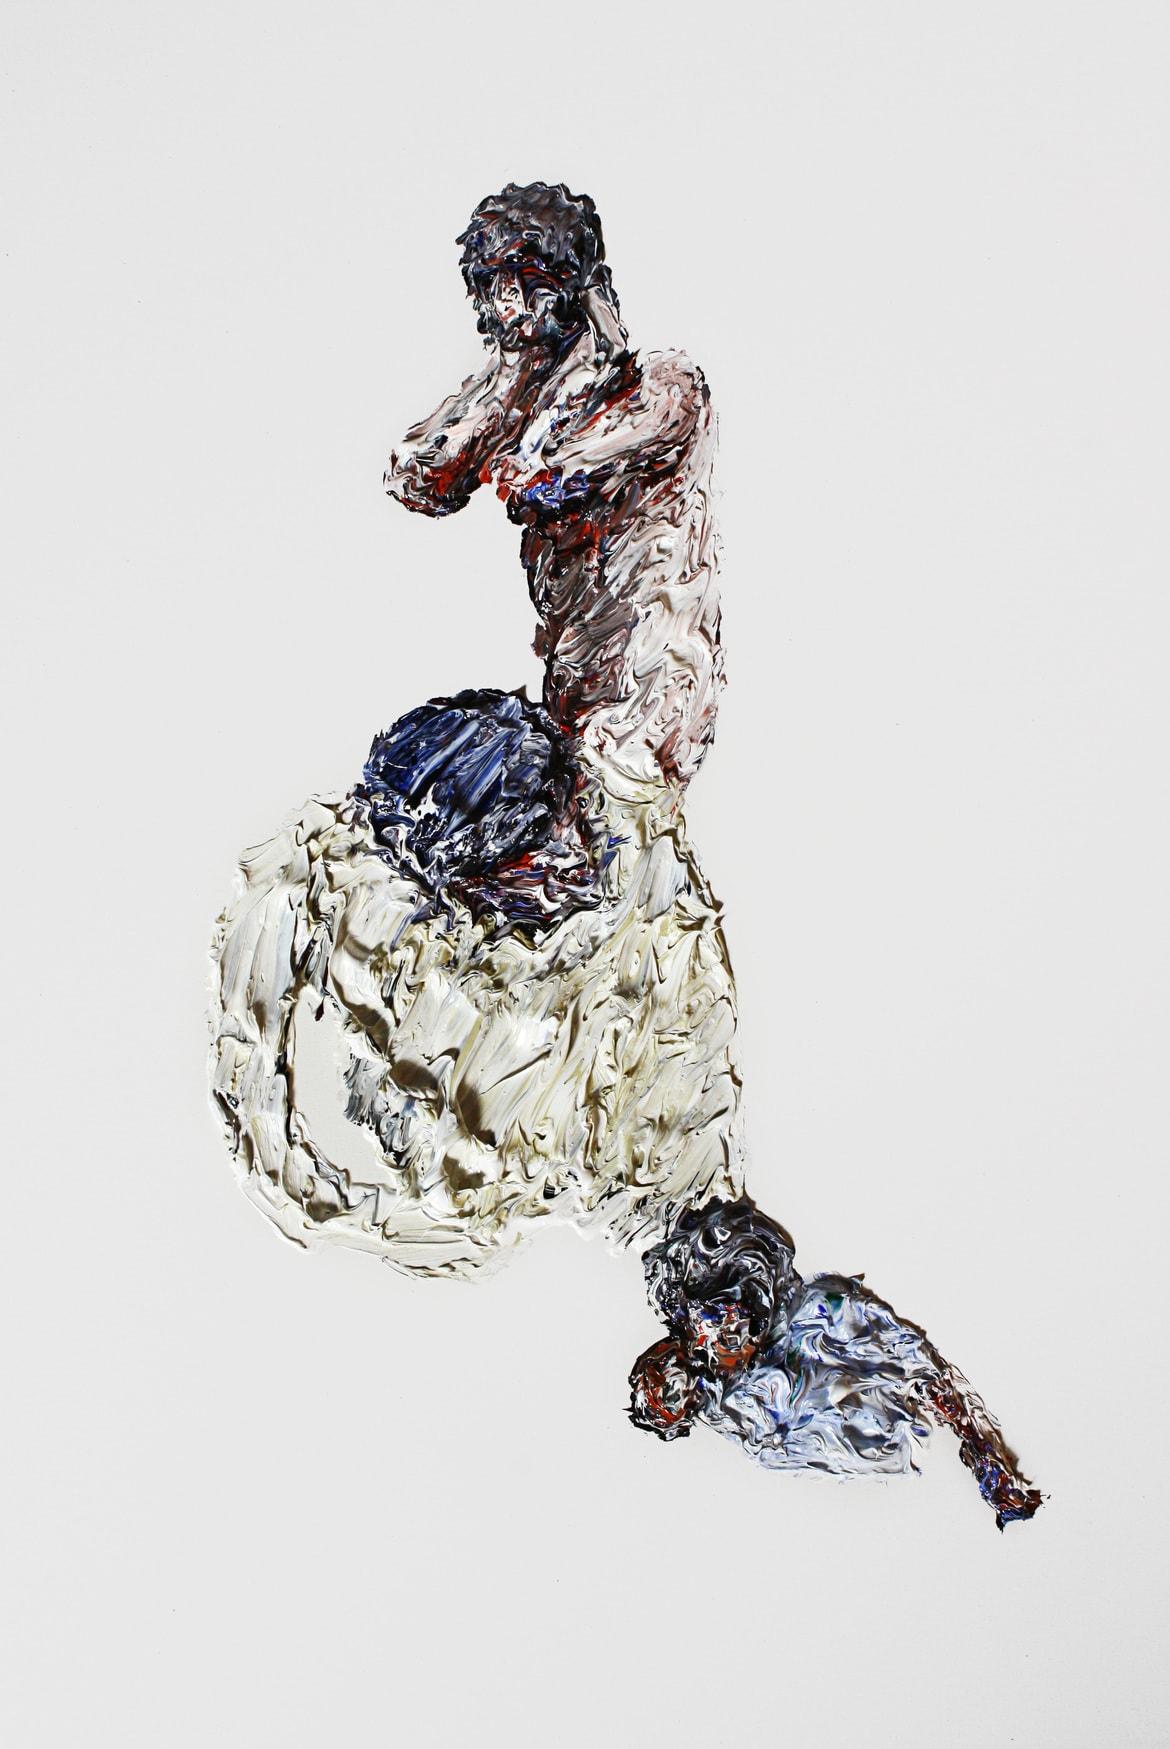 'Dissent Disorder', 2015, oil on canvas, 111 cm x 71 cm